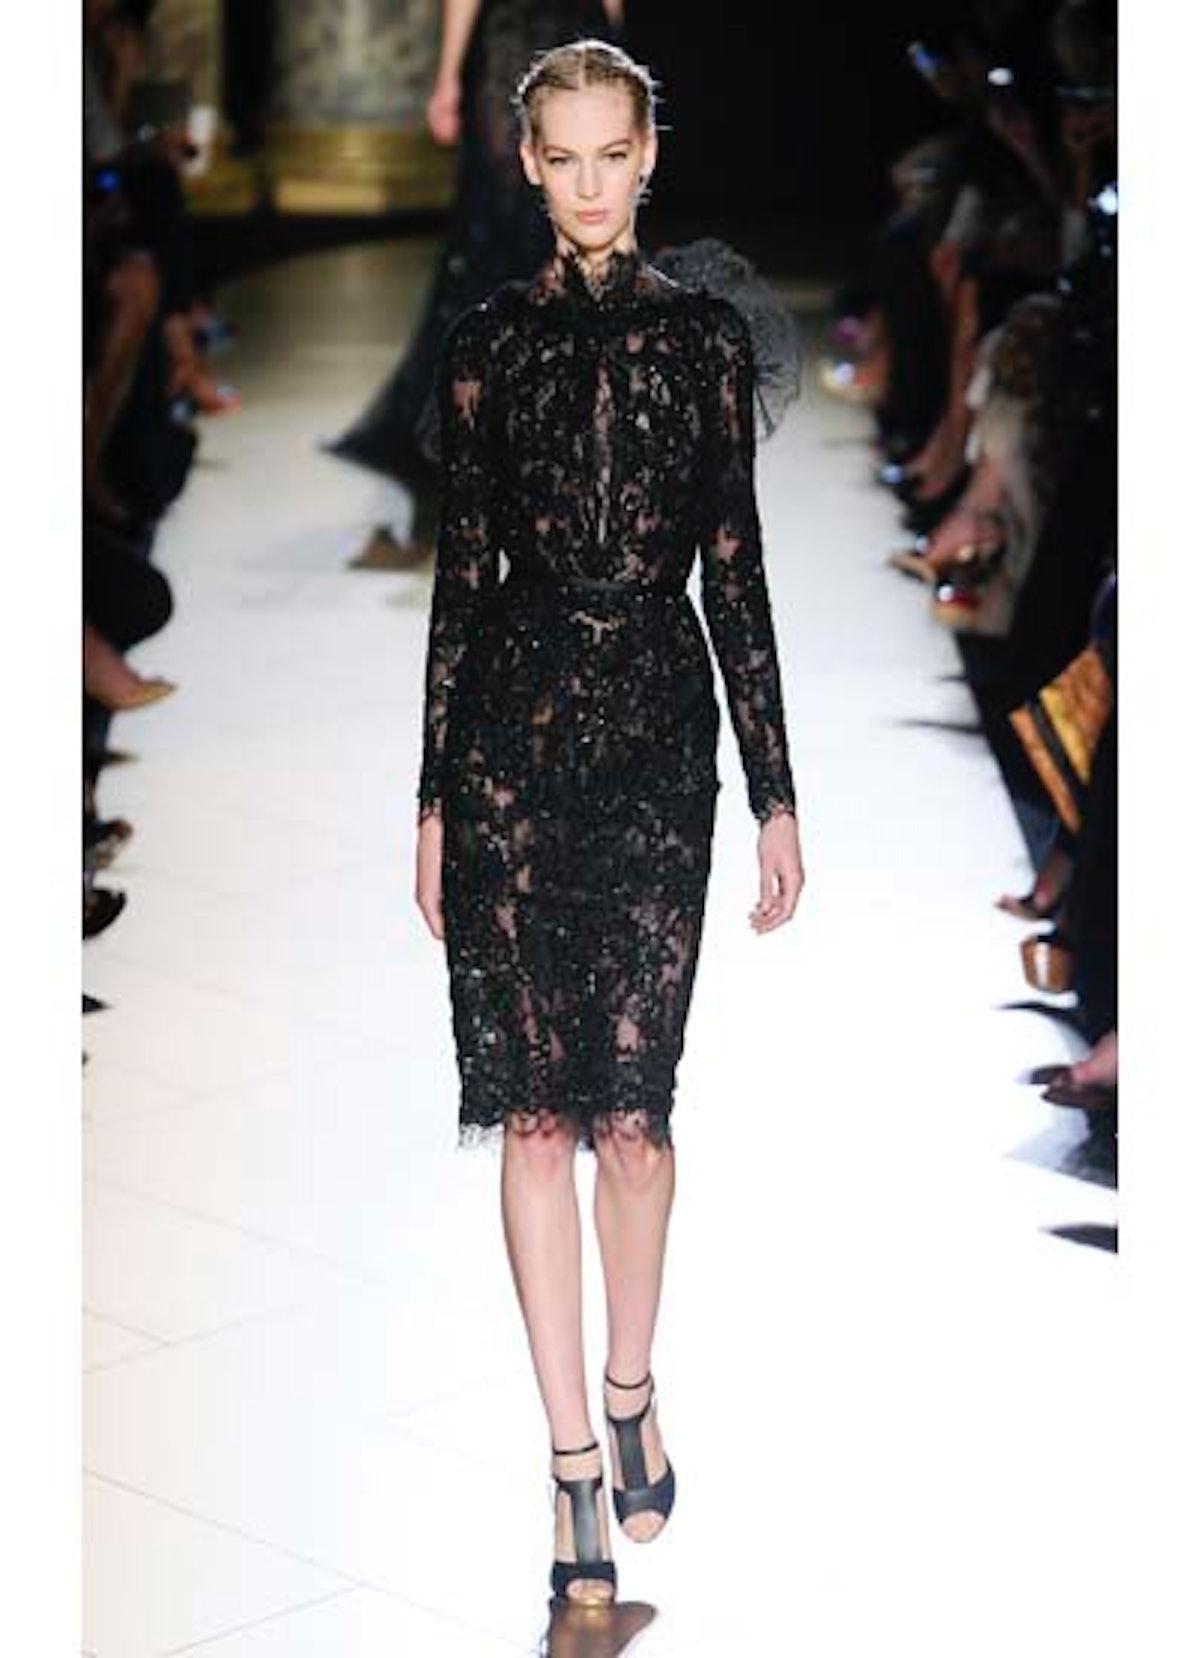 fass-elie-saab-couture-2012-runway-06-v.jpg